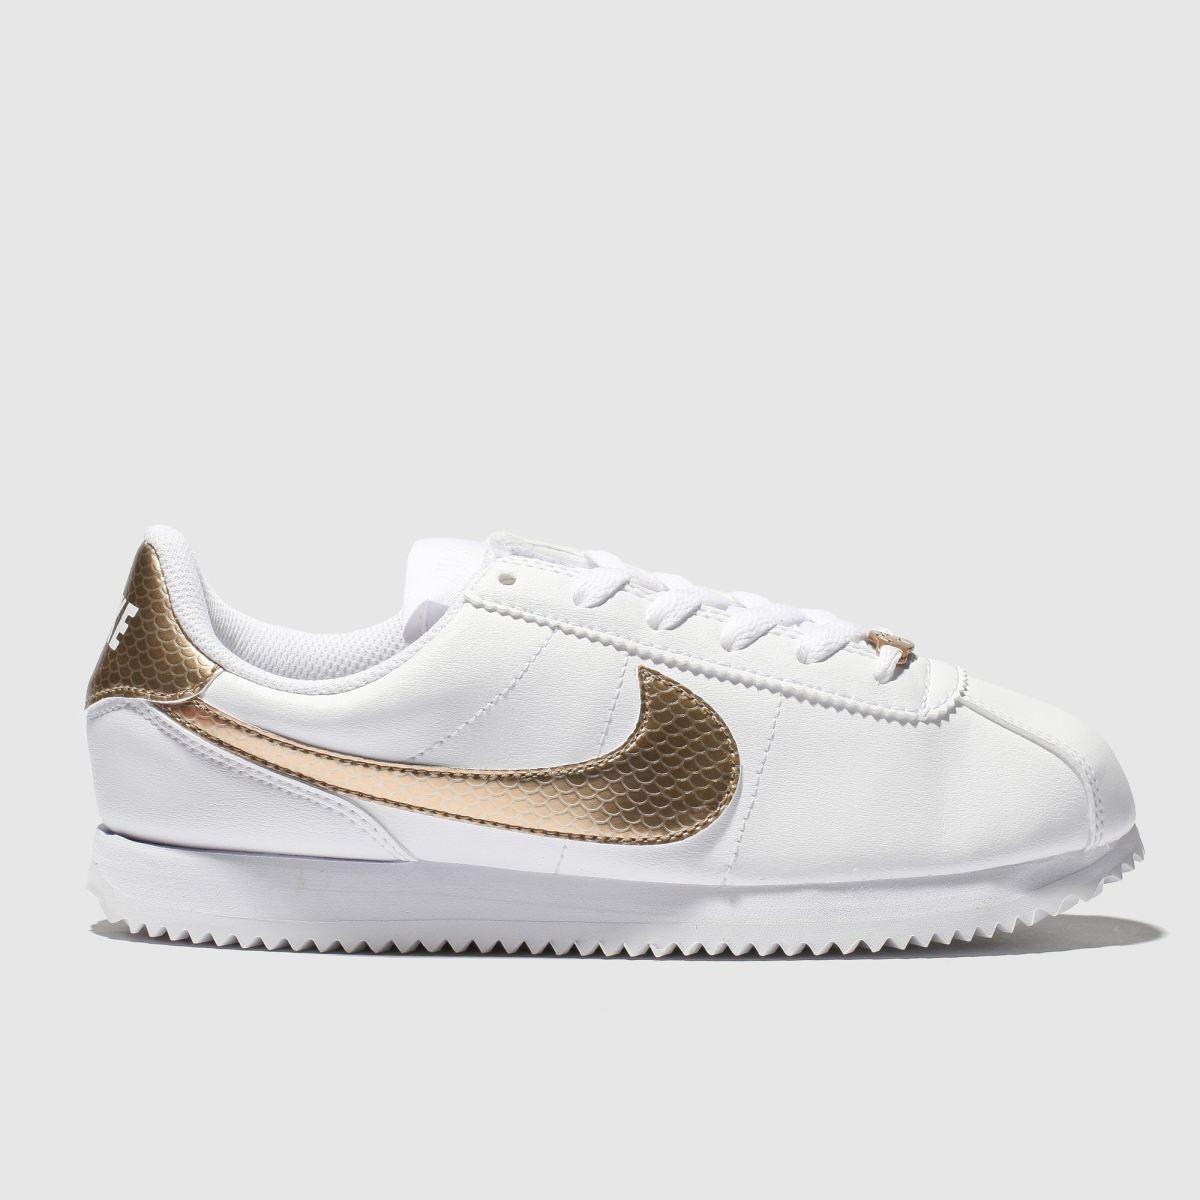 Nike White & Gold Cortex Basic Trainers Youth